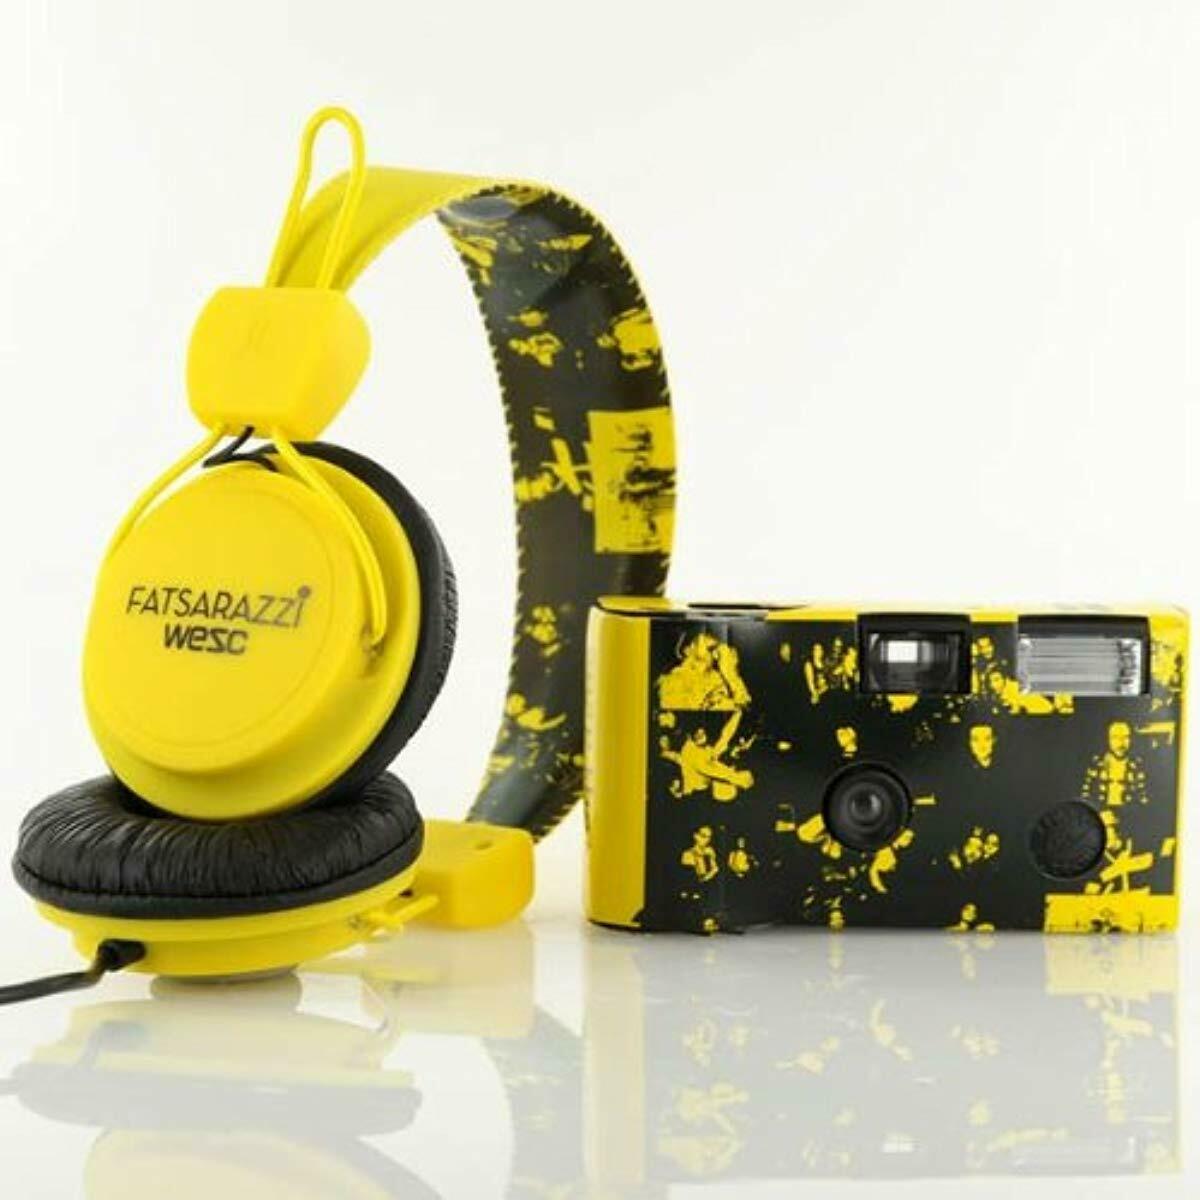 WeSC X Fatsarazzi Collab Premium Headphones + disposable Camera B105504205 NIB